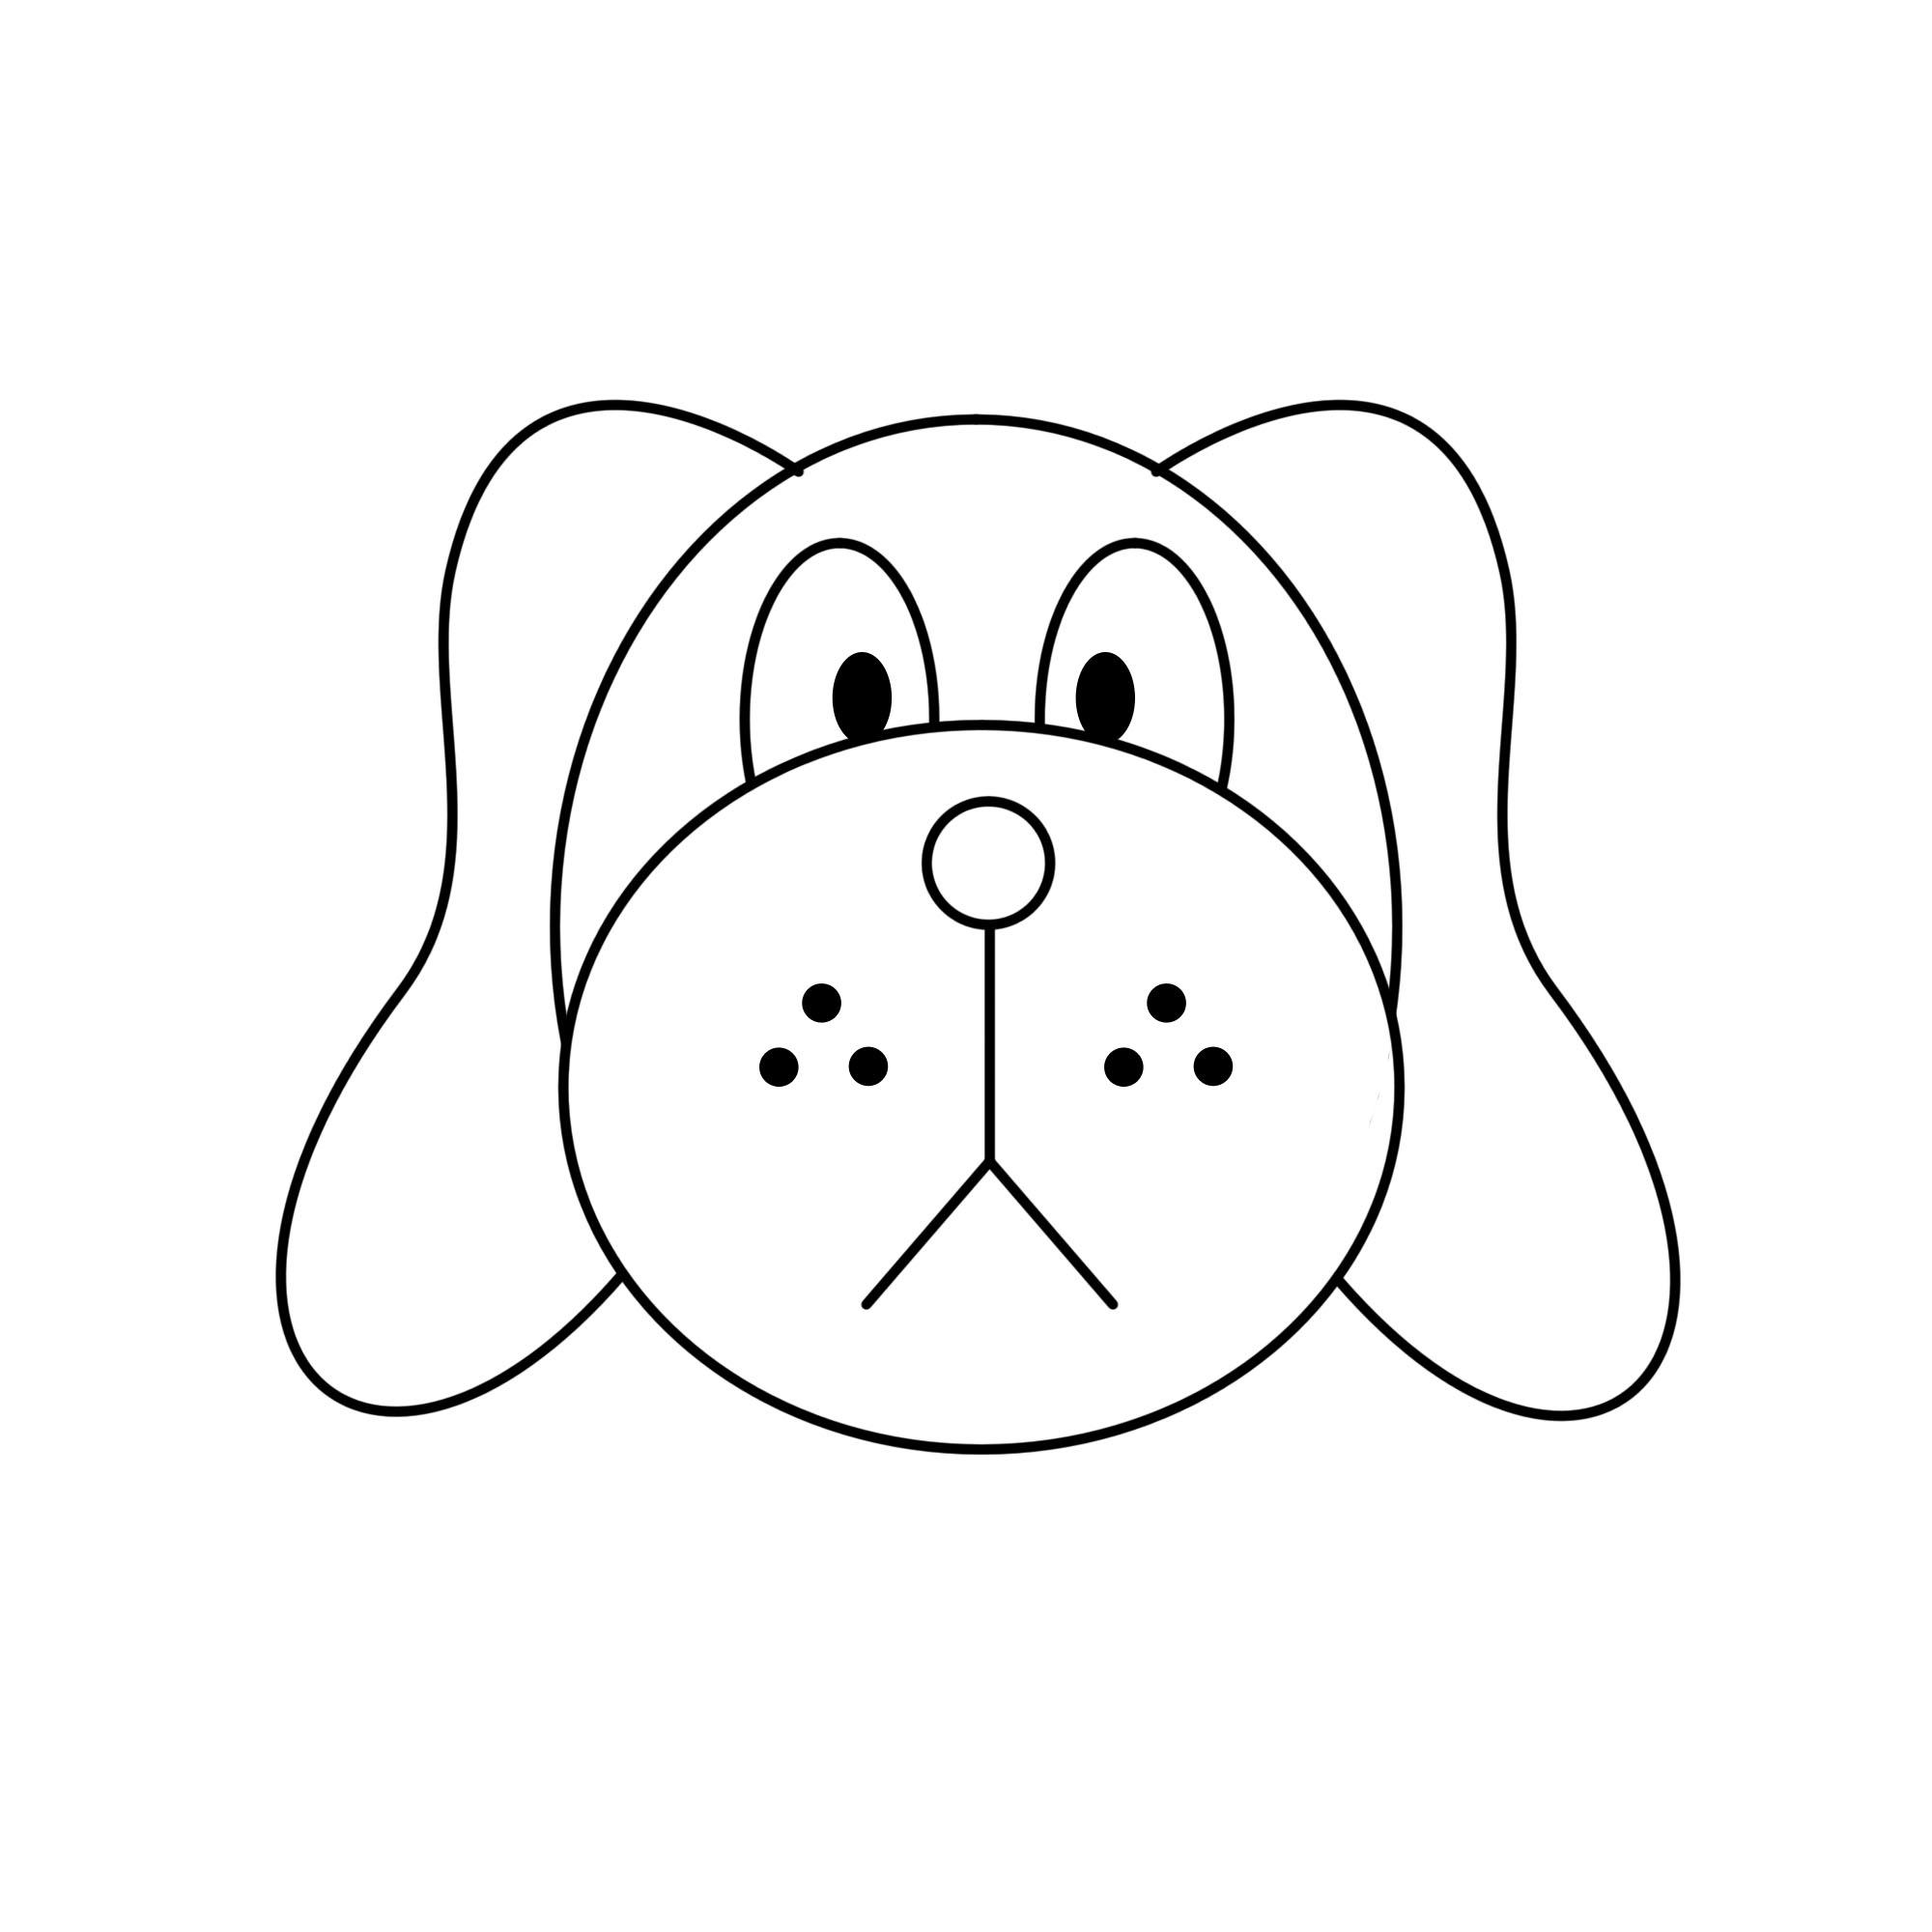 2000x2000 Animal Face Drawing Kids Colour Photos Printable Kids Coloring